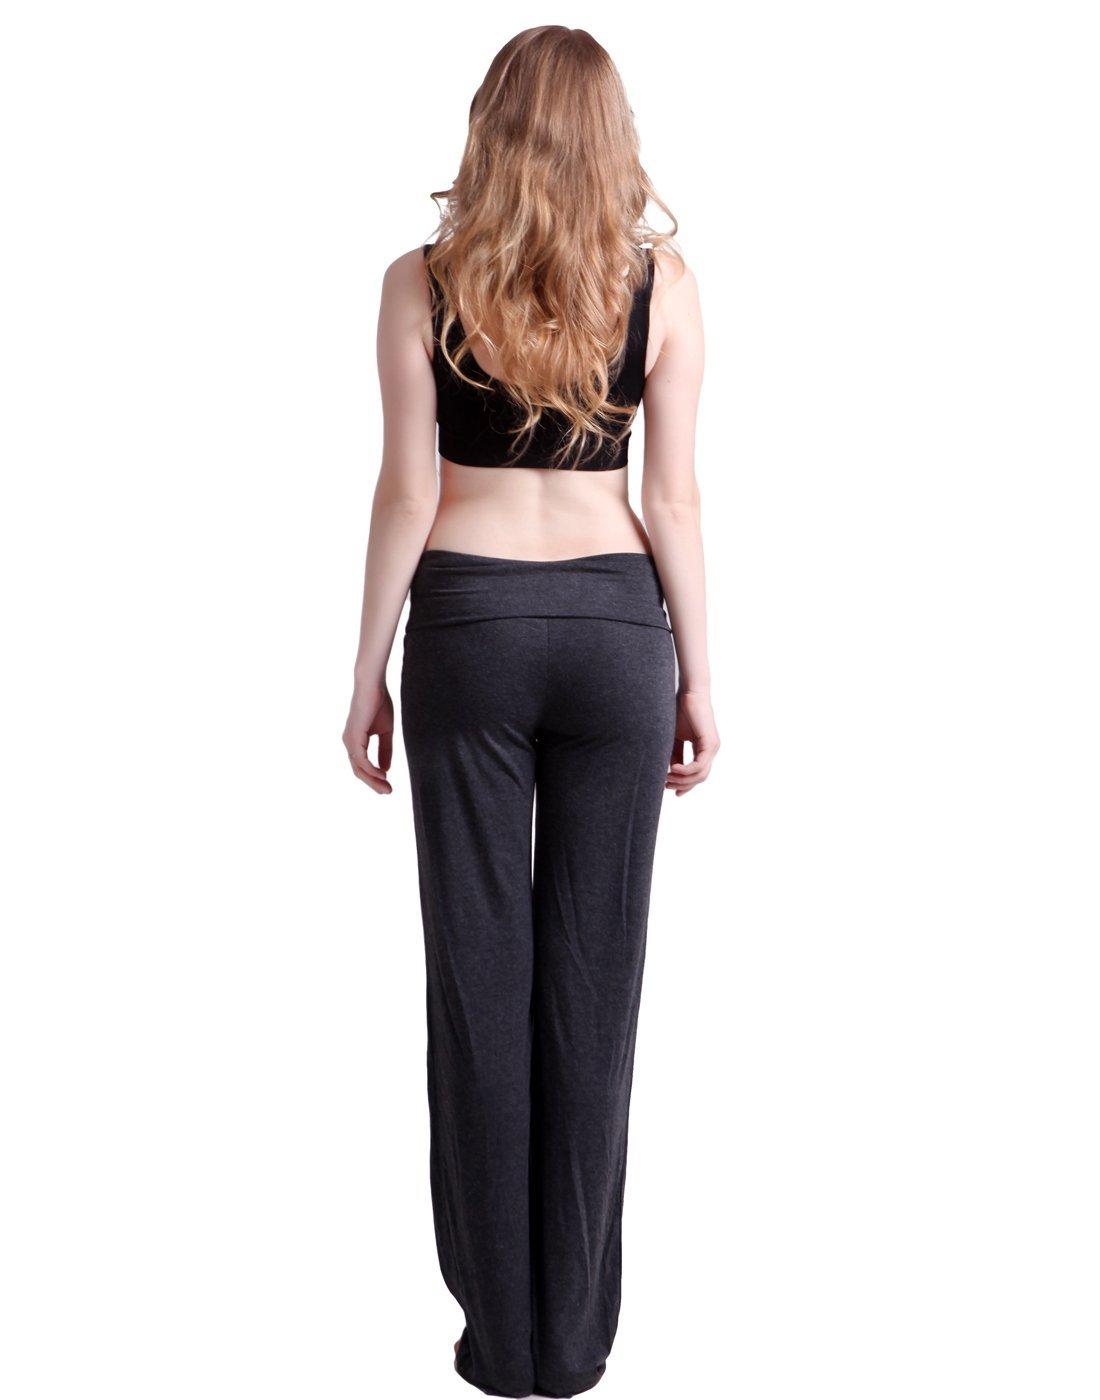 6224f08674 HDE Womens Color Block Fold Over Waist Yoga Pants Flare Leg Workout Leggings